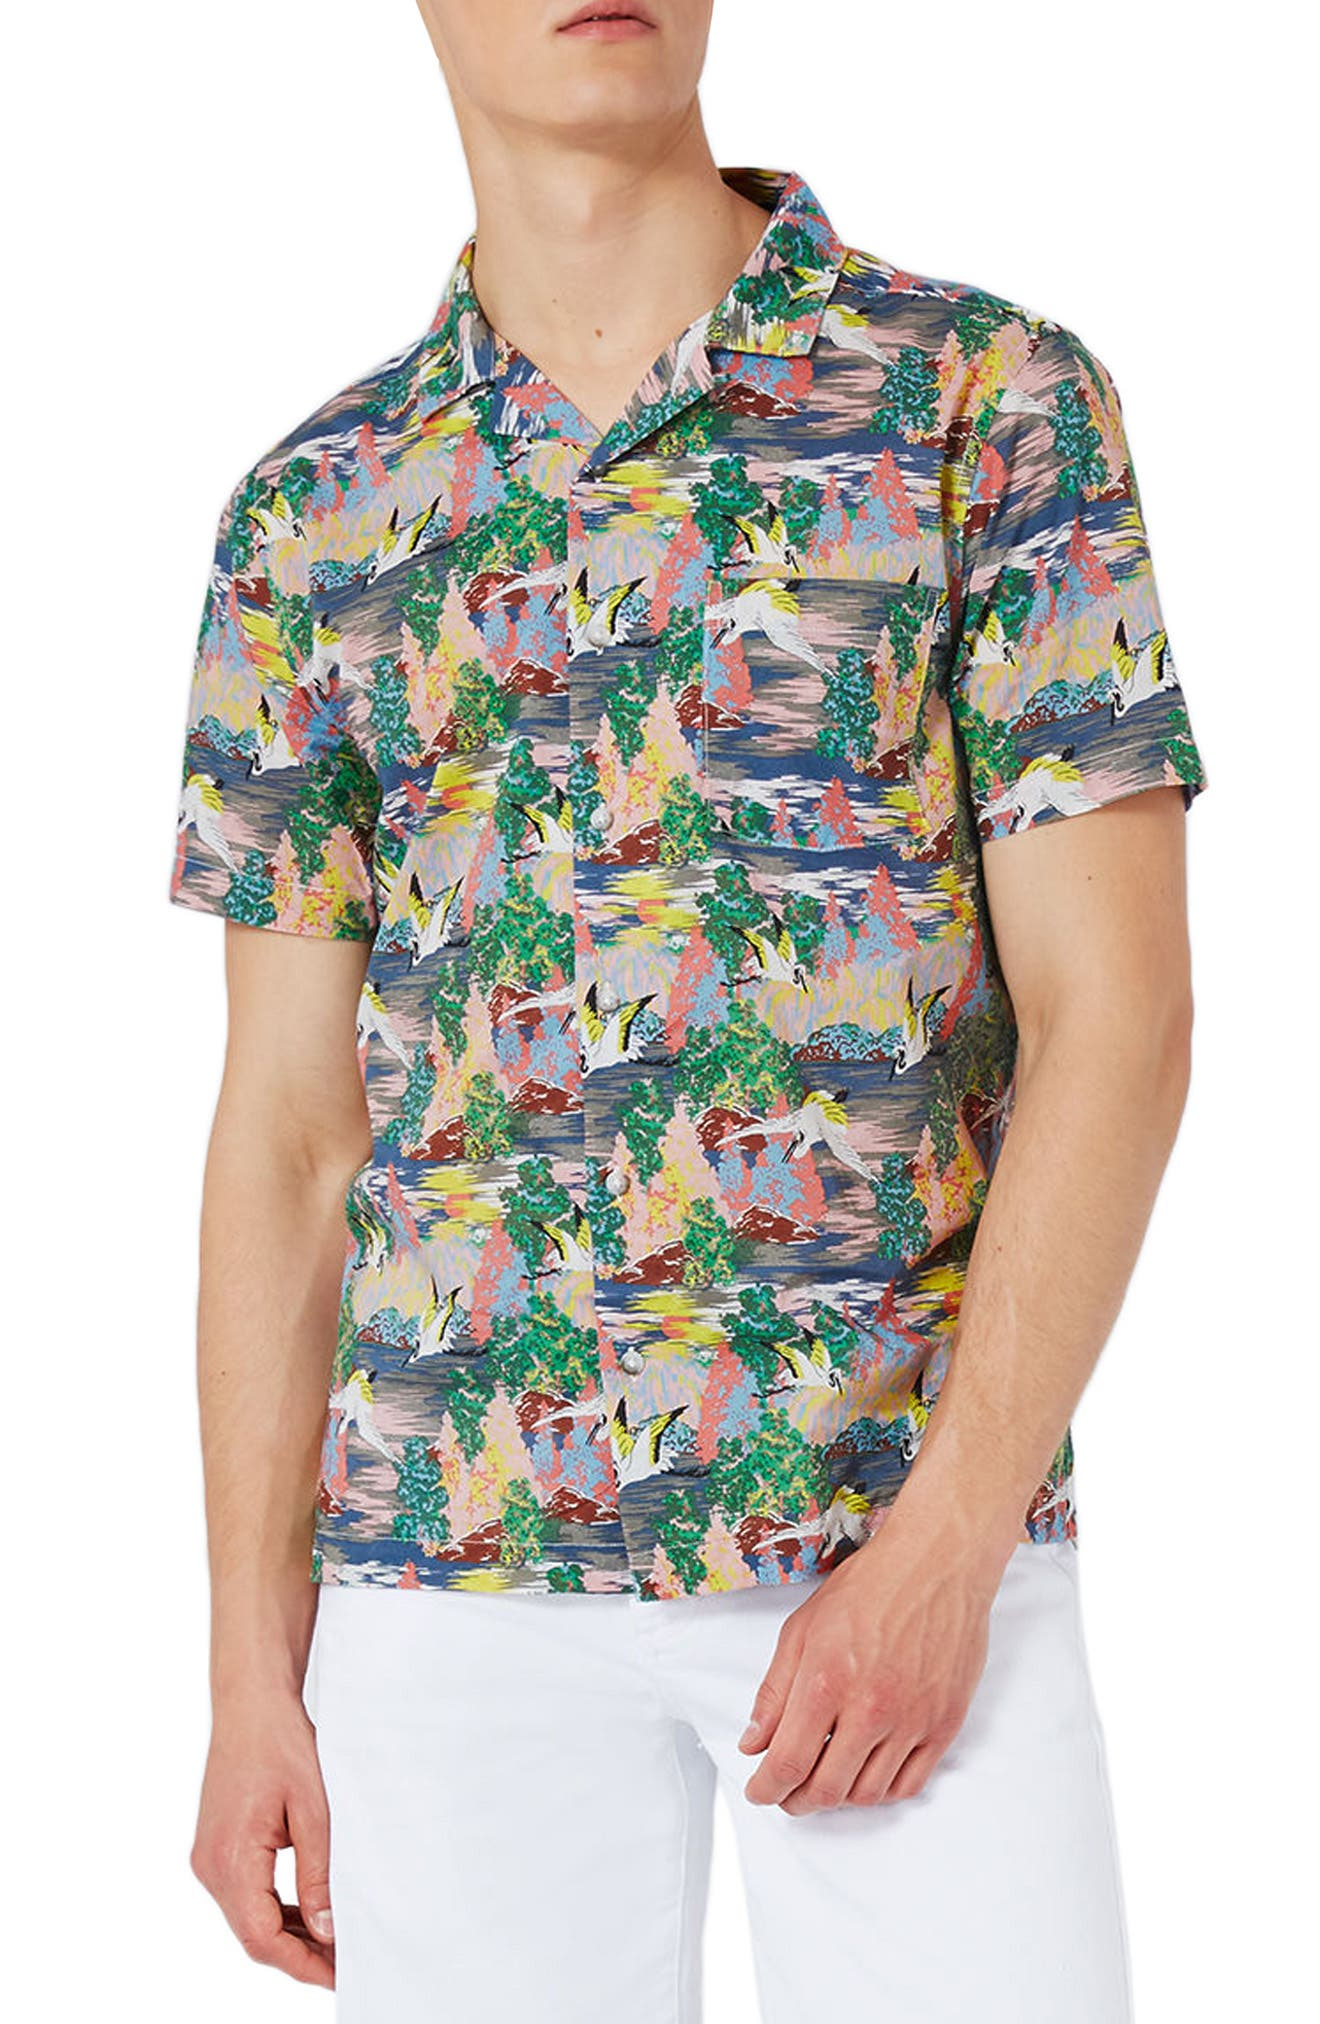 Heron Print Shirt,                         Main,                         color, 400